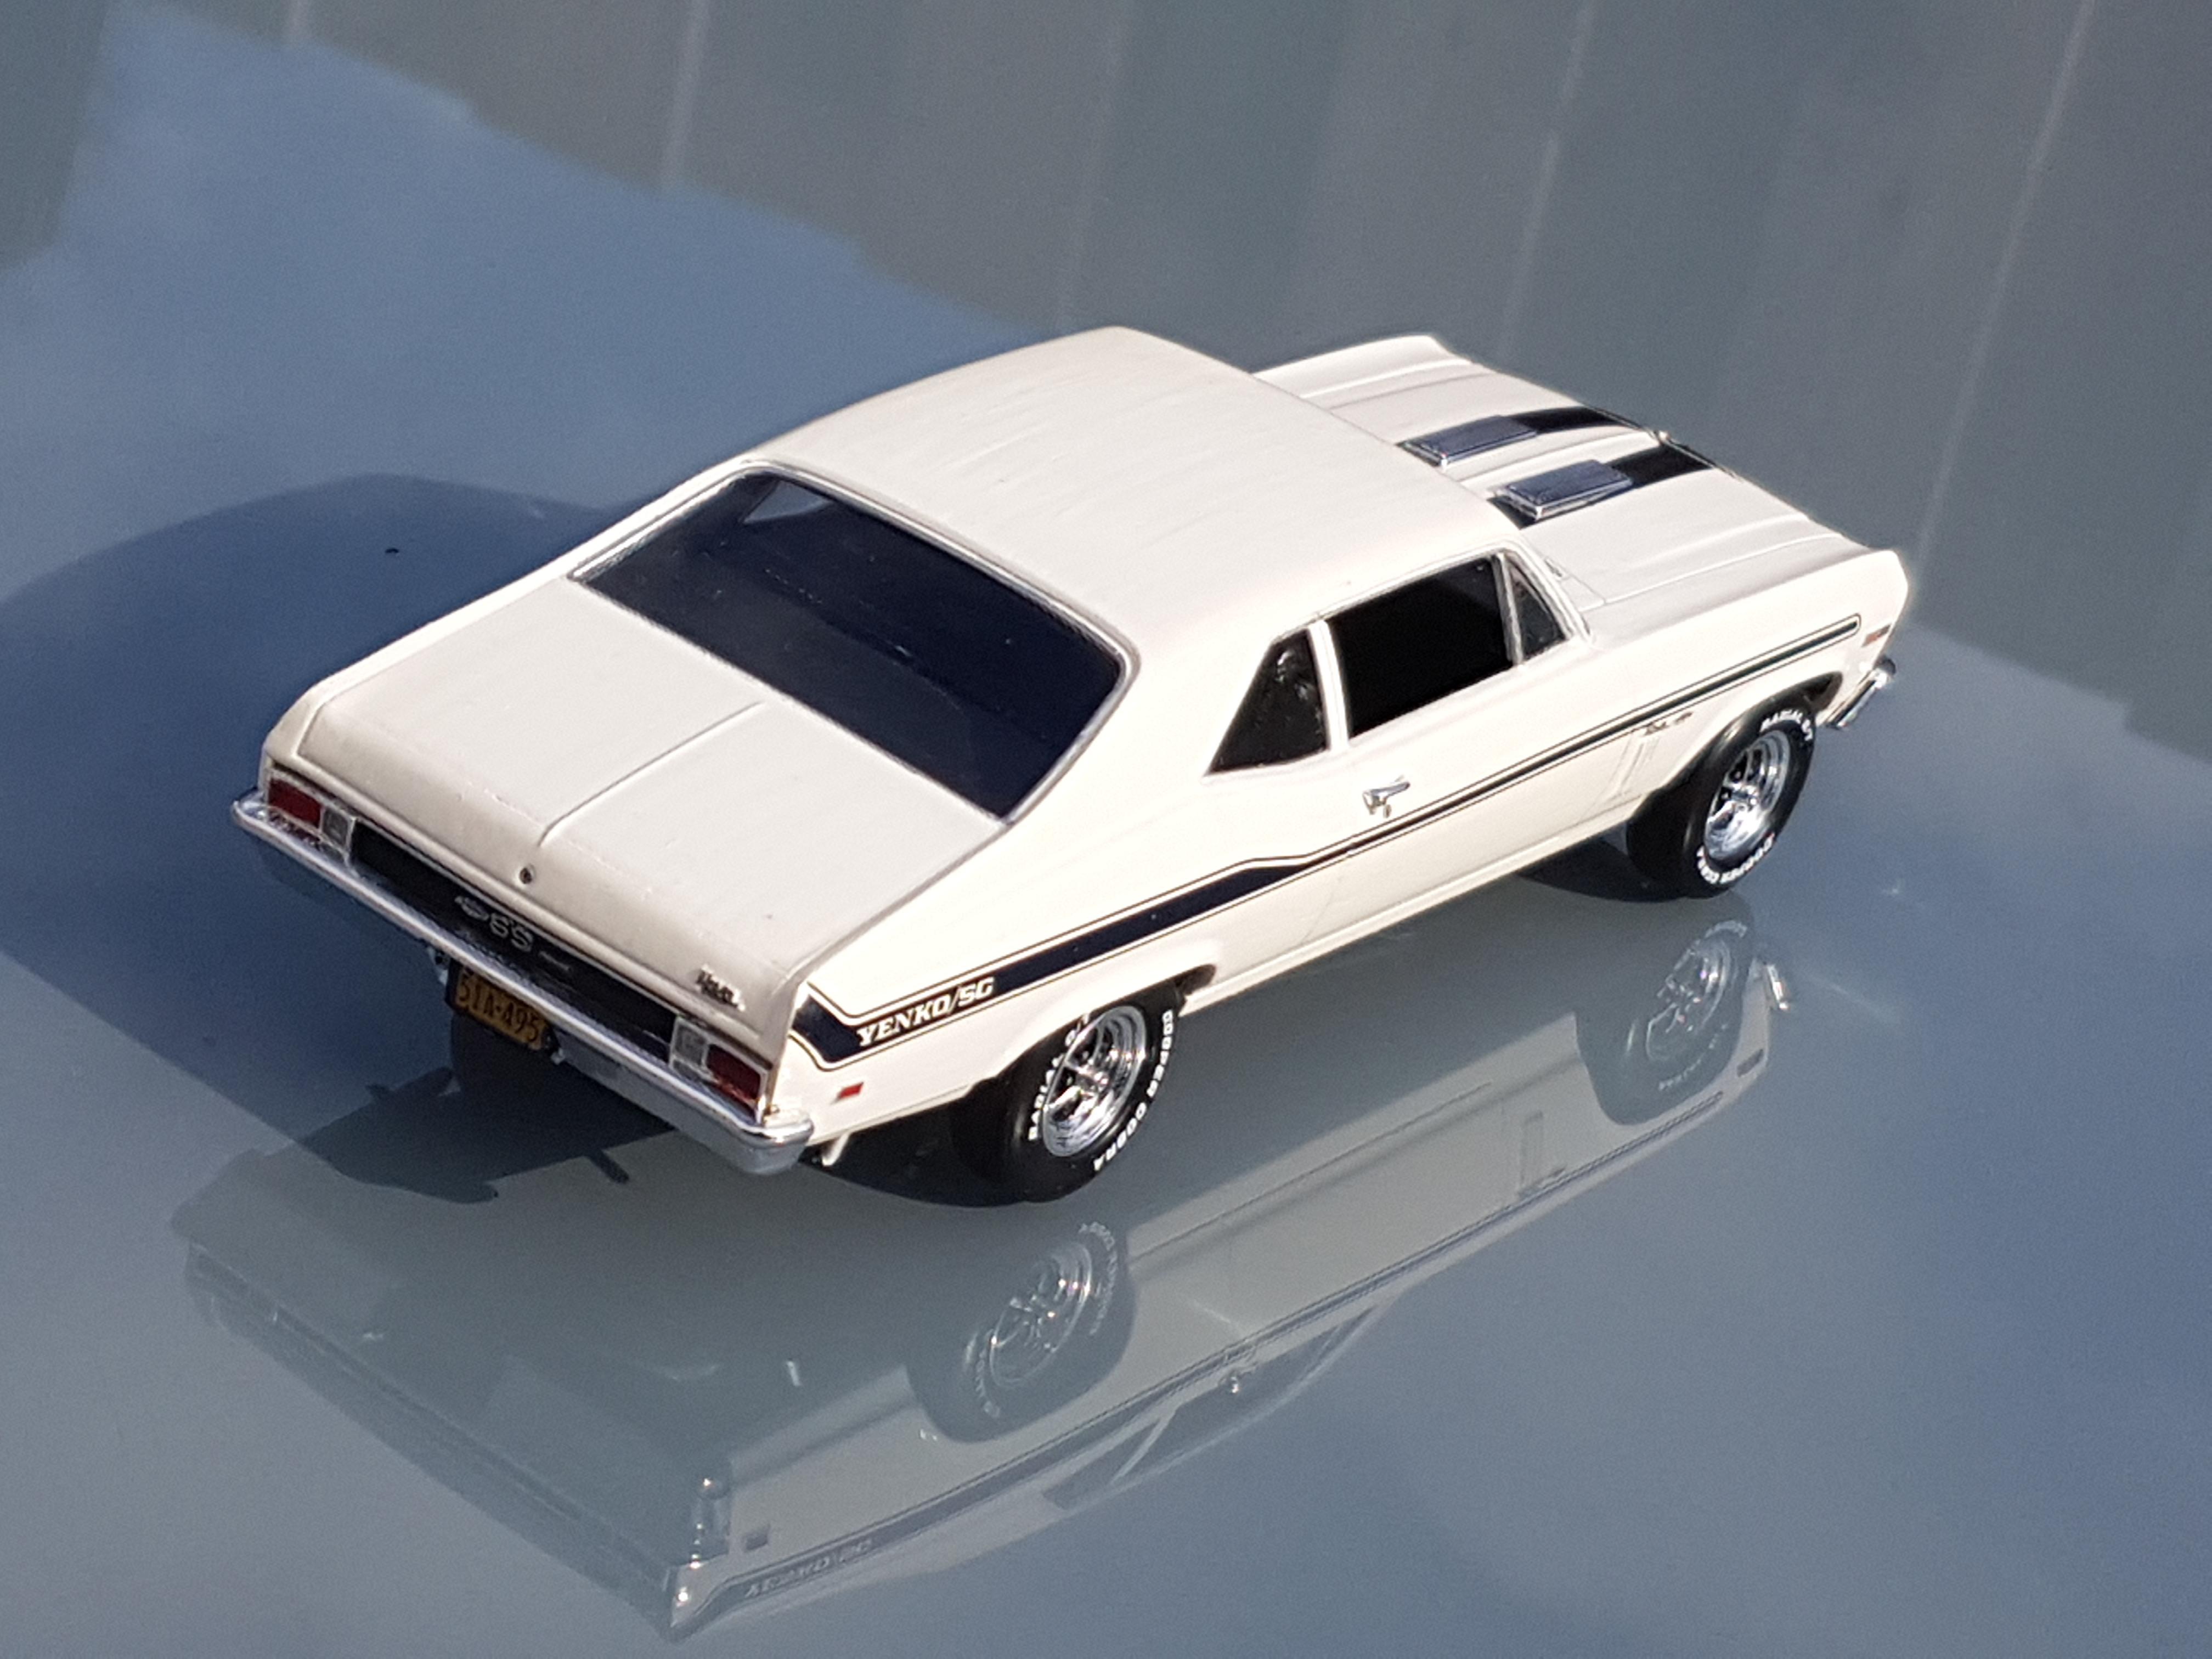 Chevrolet Camaro Yenko further Img as well  further Engine Web as well Chevrolet Camaro Yenko Sc. on 1969 427 copo chevelle